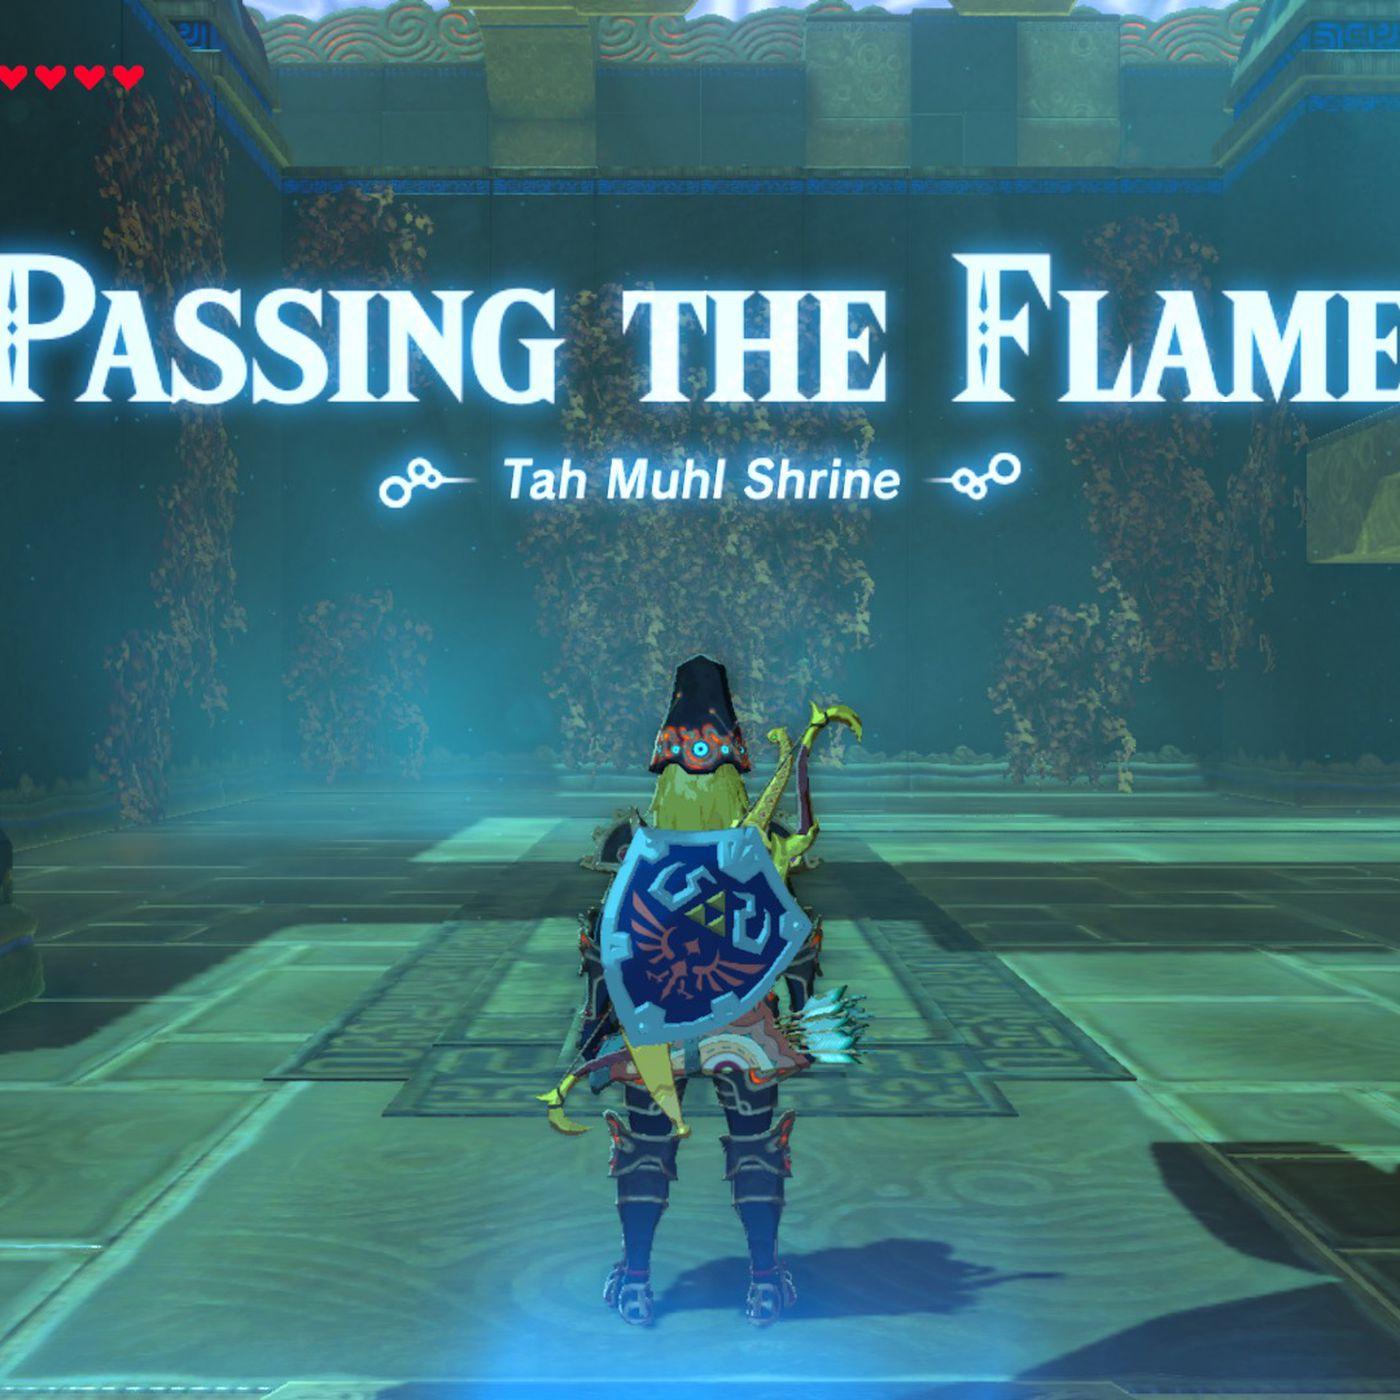 Zelda: Breath of the Wild guide: Tah Muhl shrine location, treasure